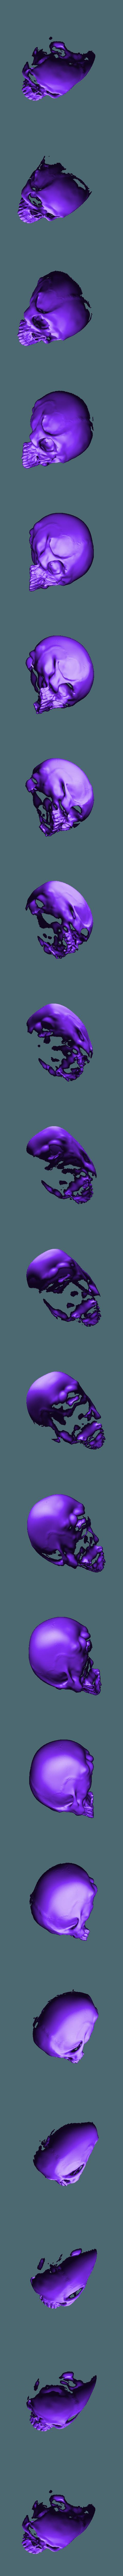 Human Skull By christelle79.stl Download free STL file Human Skull • 3D print model, christelle79